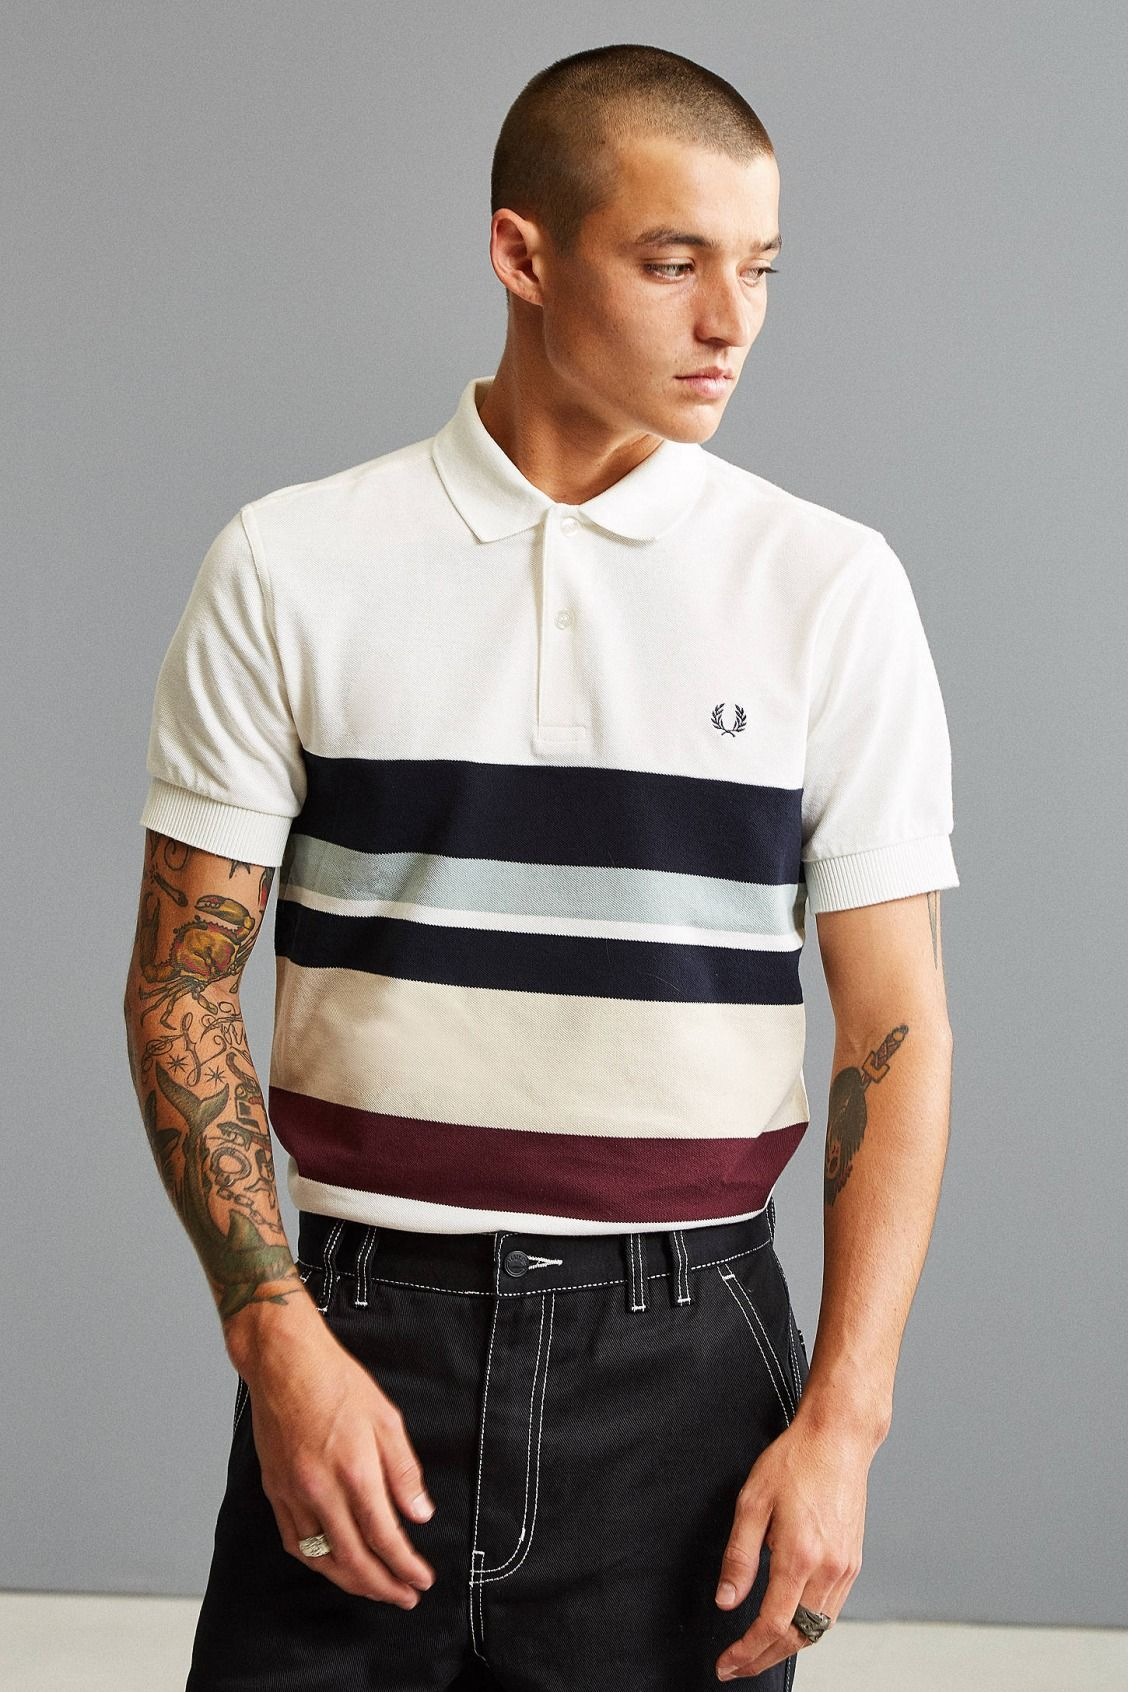 a60d0a4528 Fred Perry Stripe Pique Polo Shirt | New Arrivals | Pique polo shirt ...